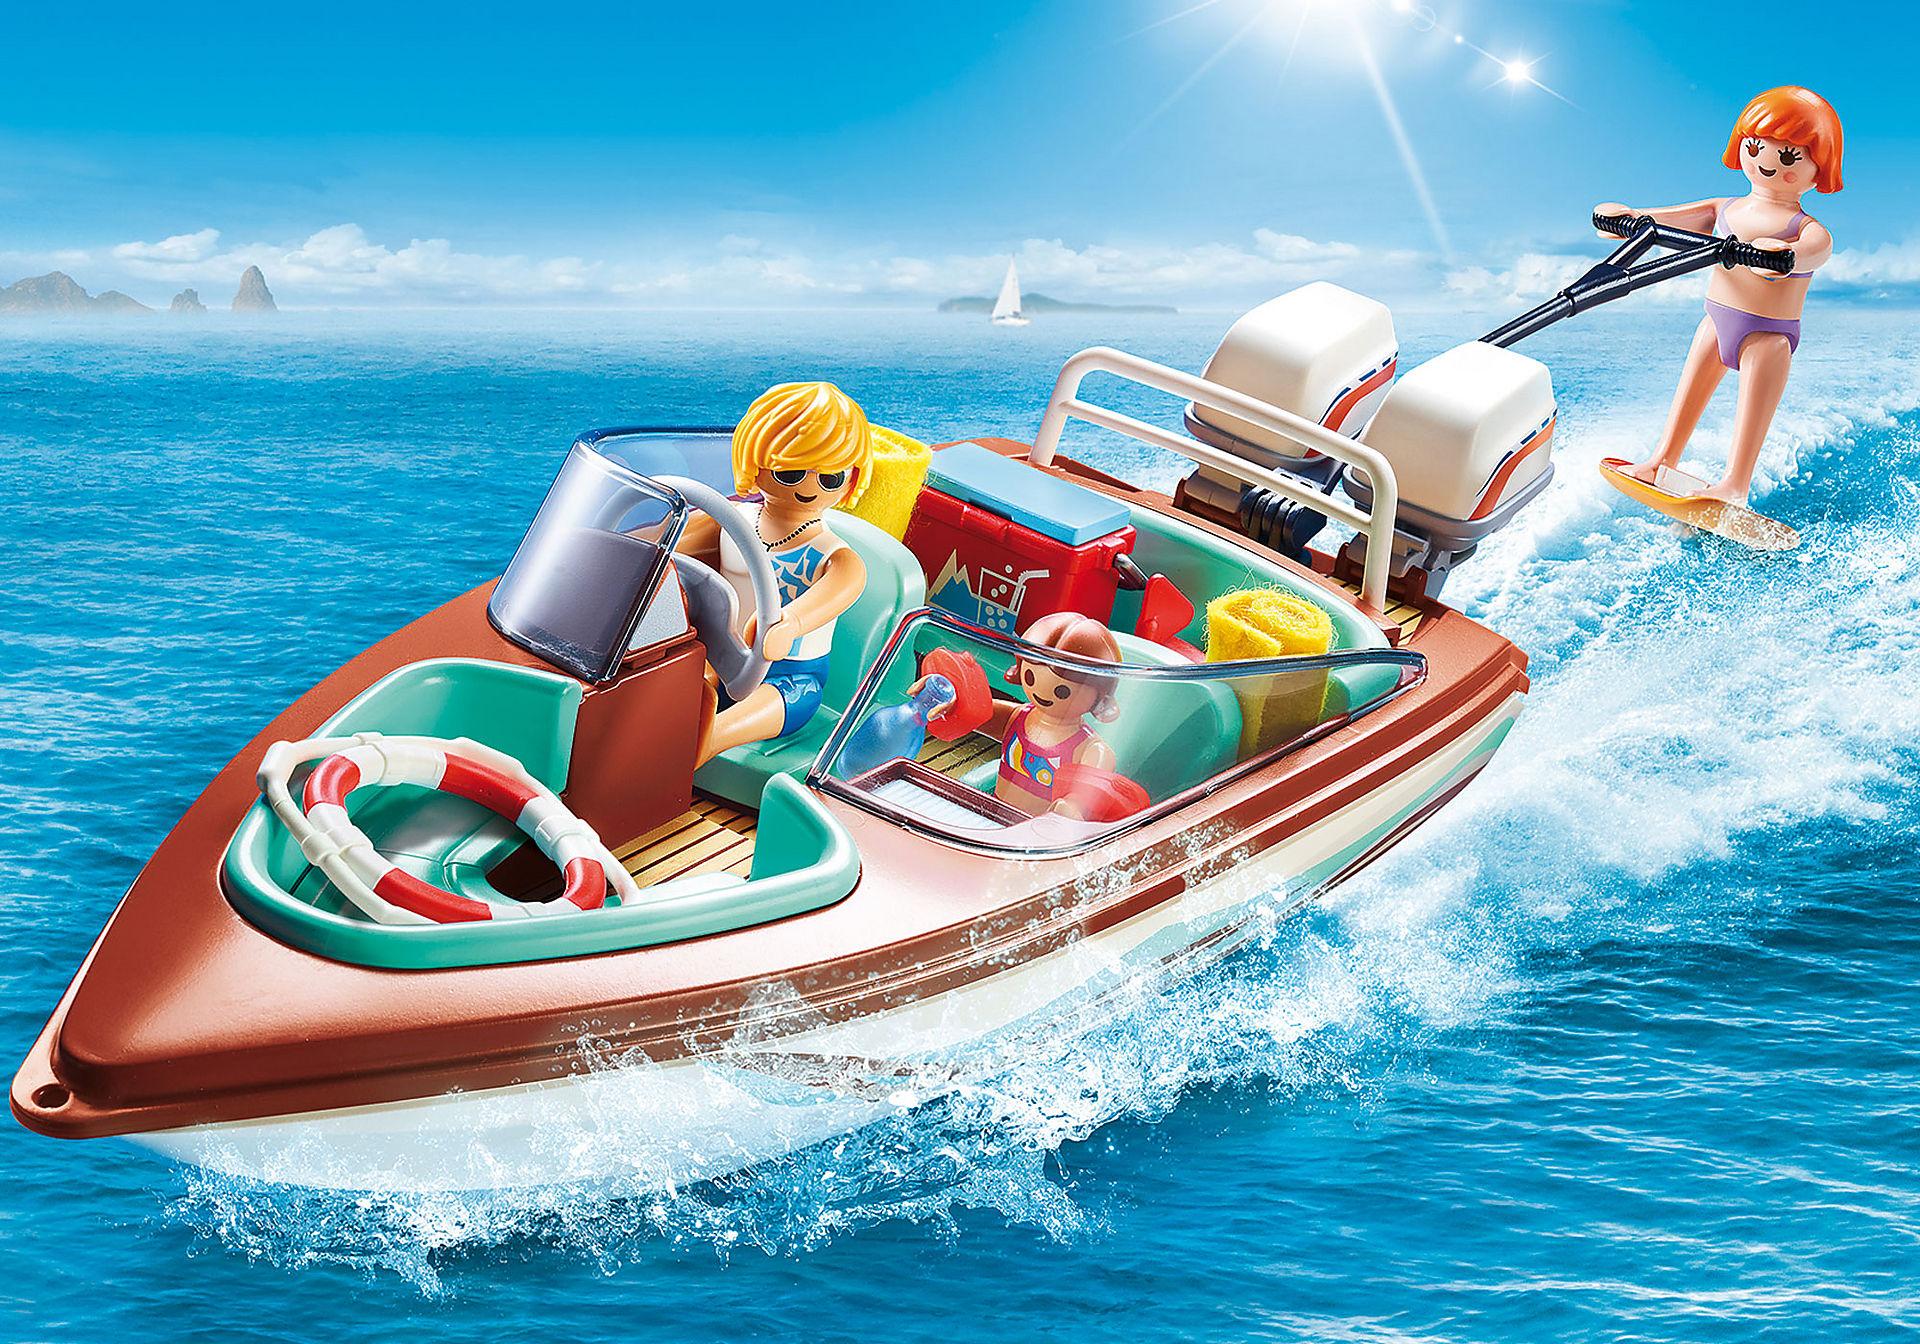 9428 Lancha Motora con motor submarino zoom image1